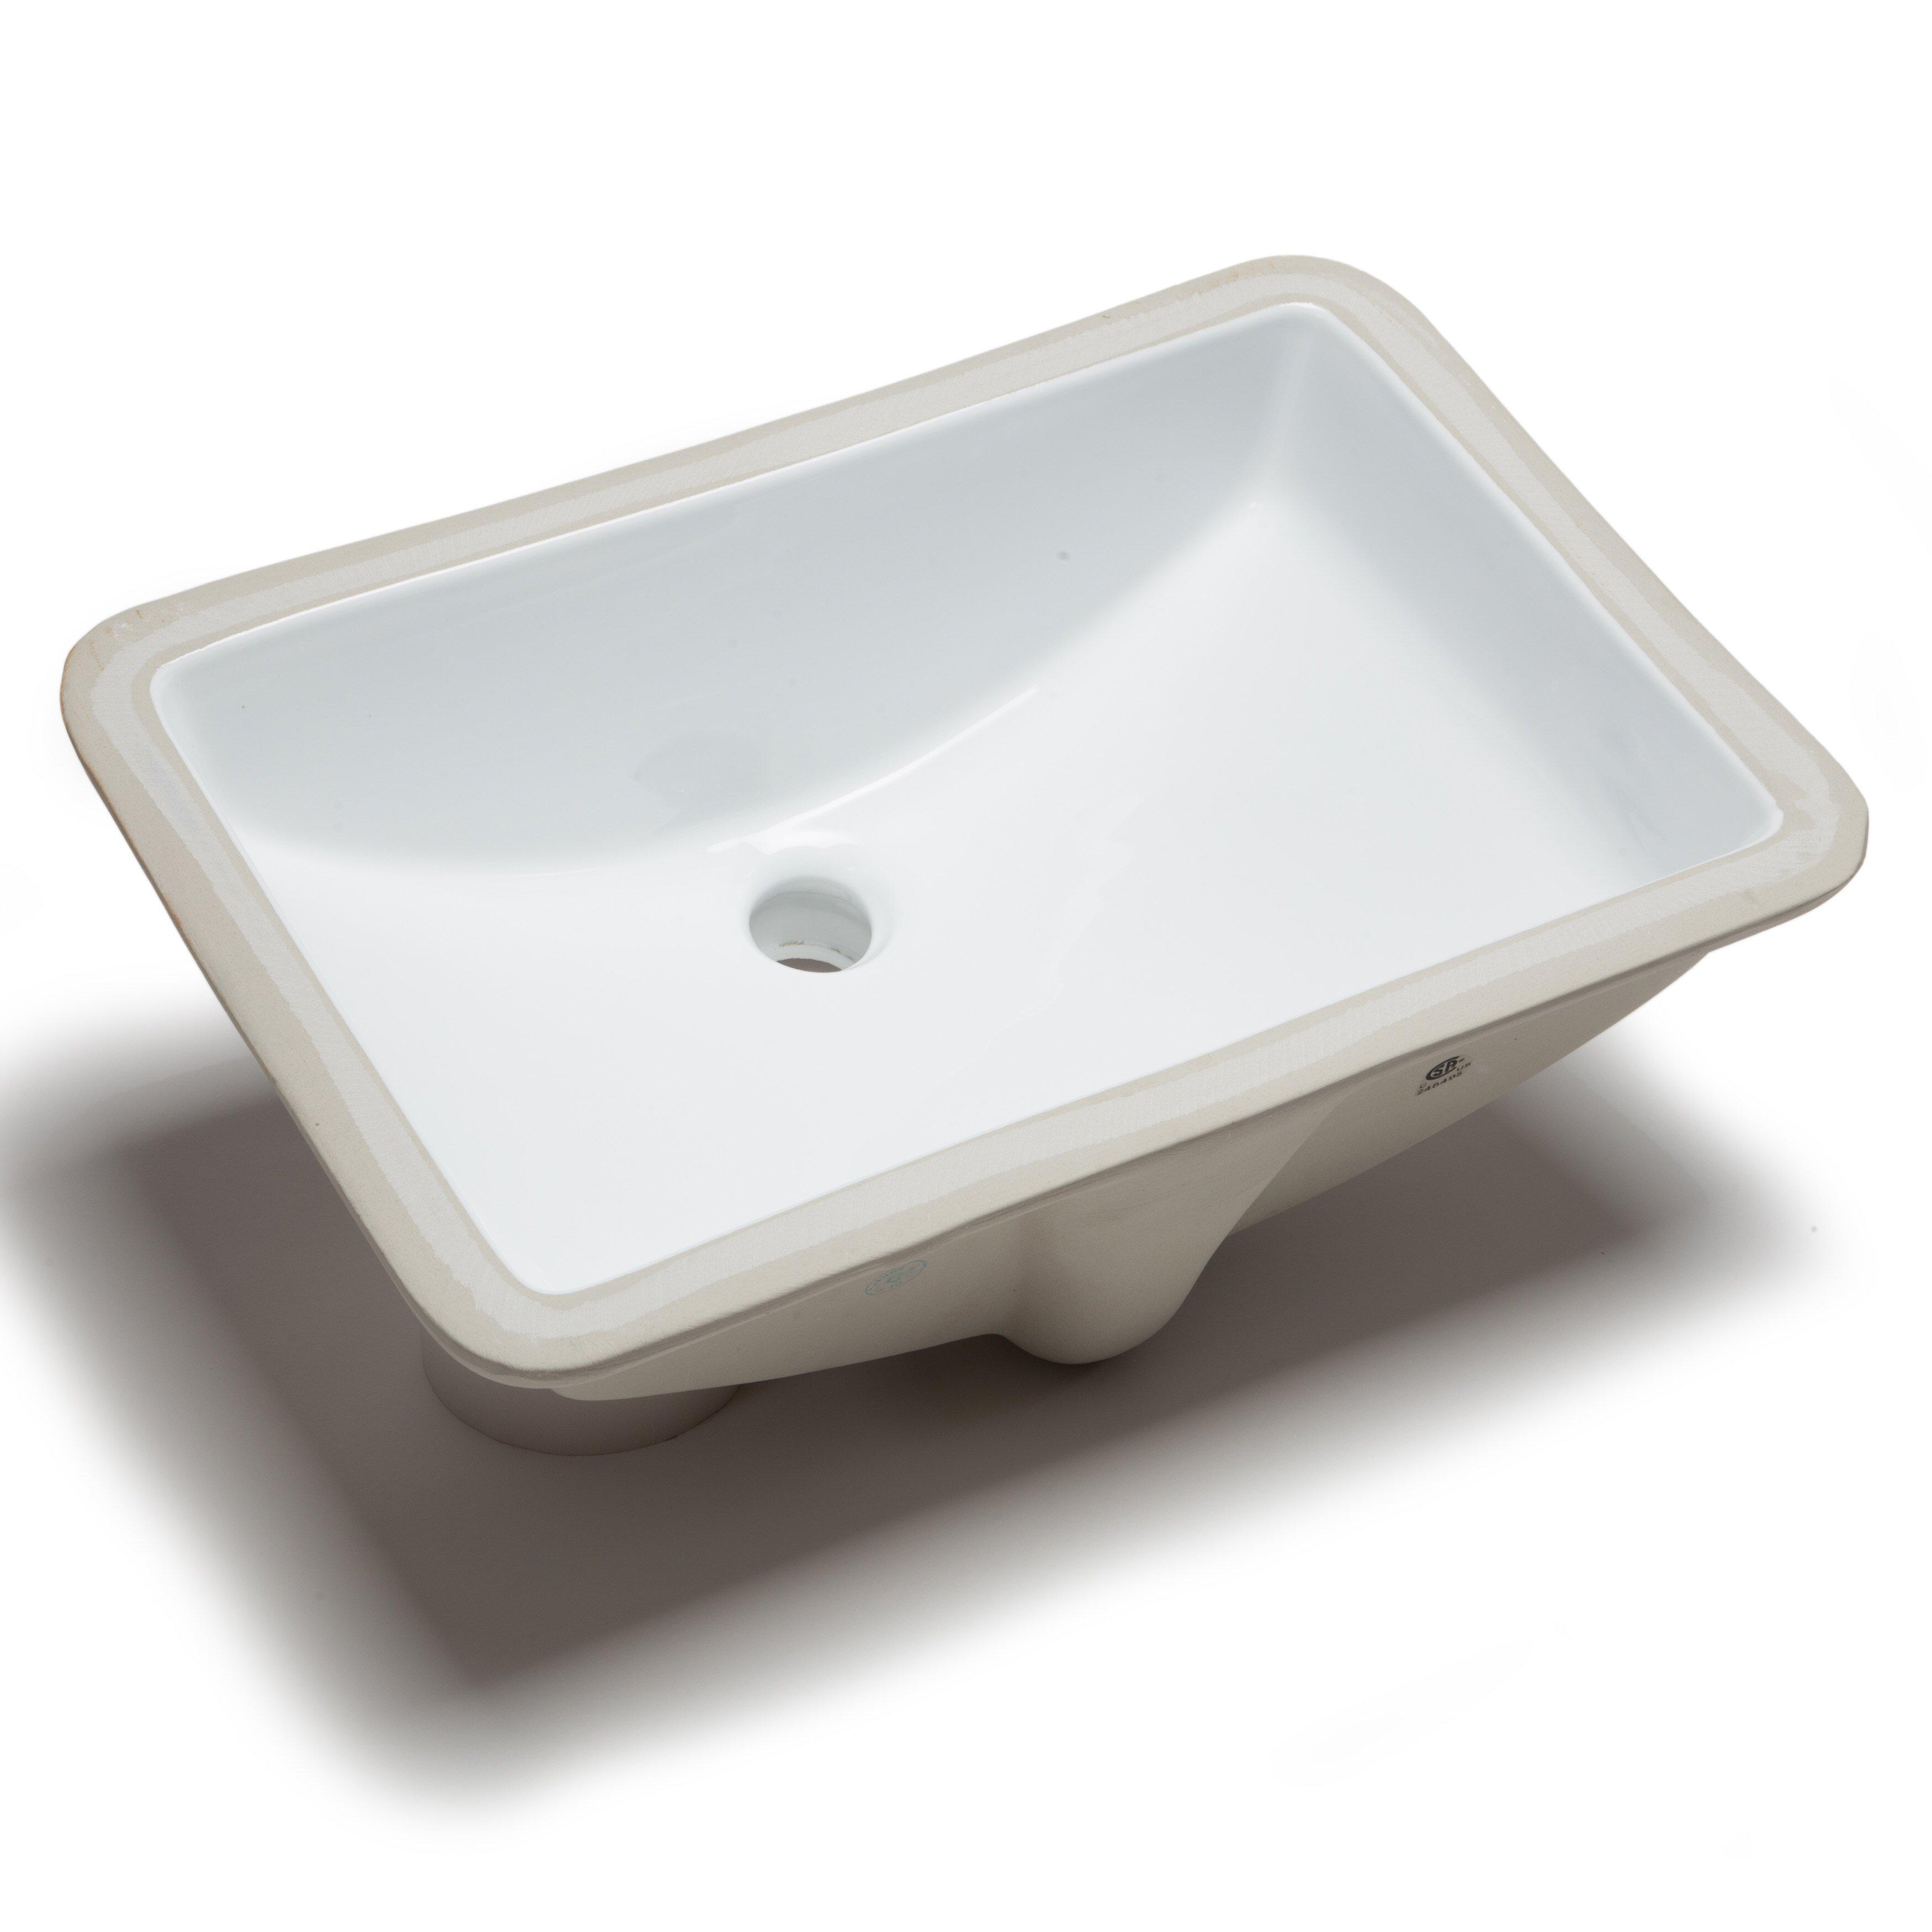 Hahn ceramic bowl rectangular undermount bathroom sink with overflow reviews wayfair Undermount bathroom sink bowl